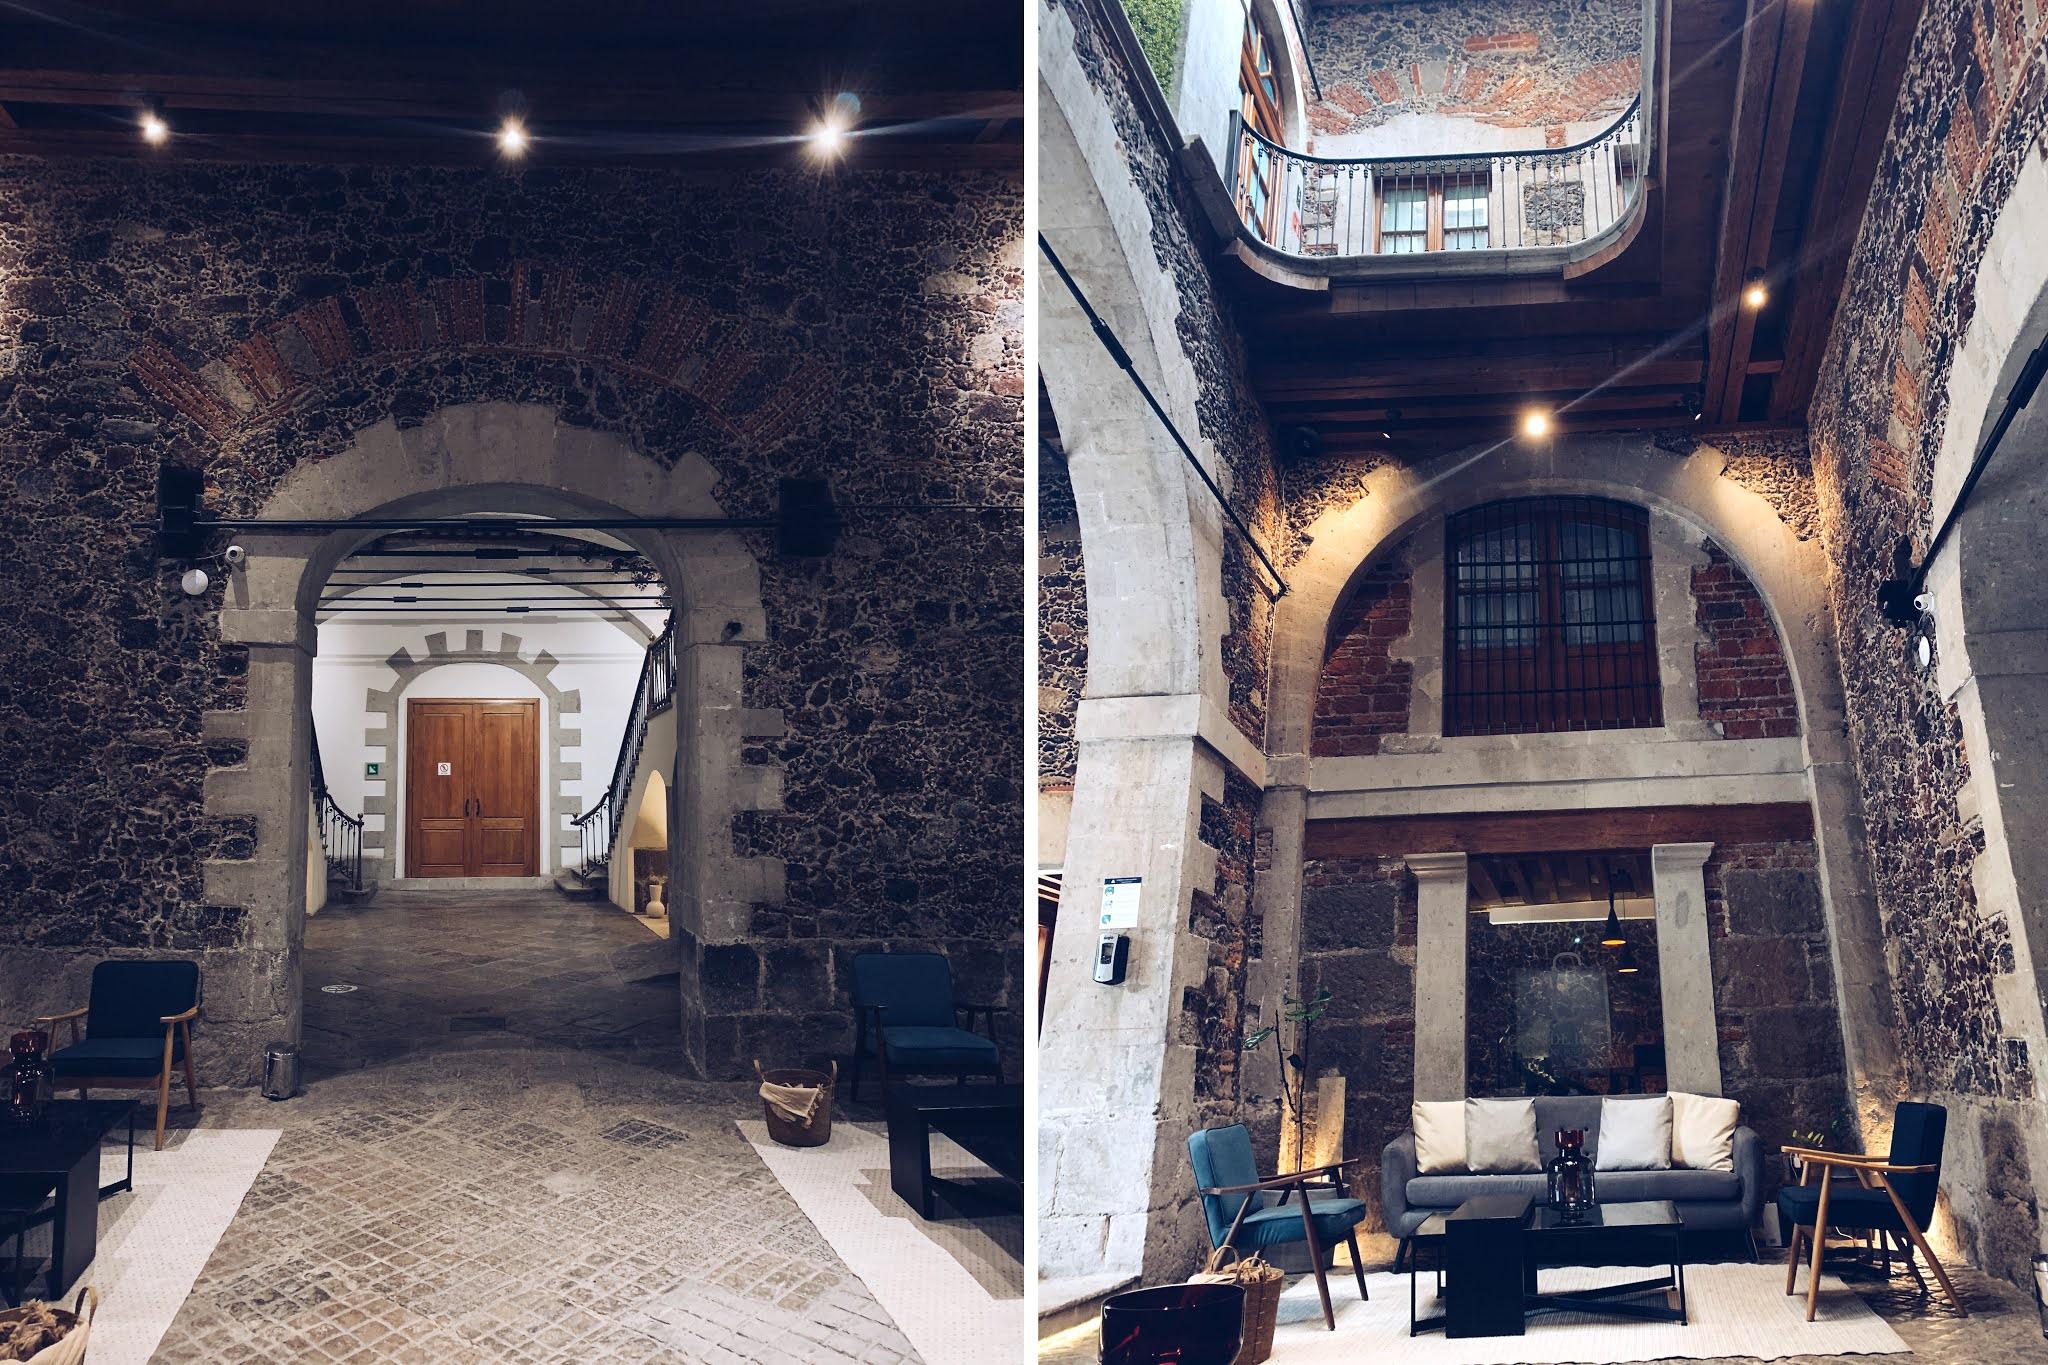 historical architecture Mexico City